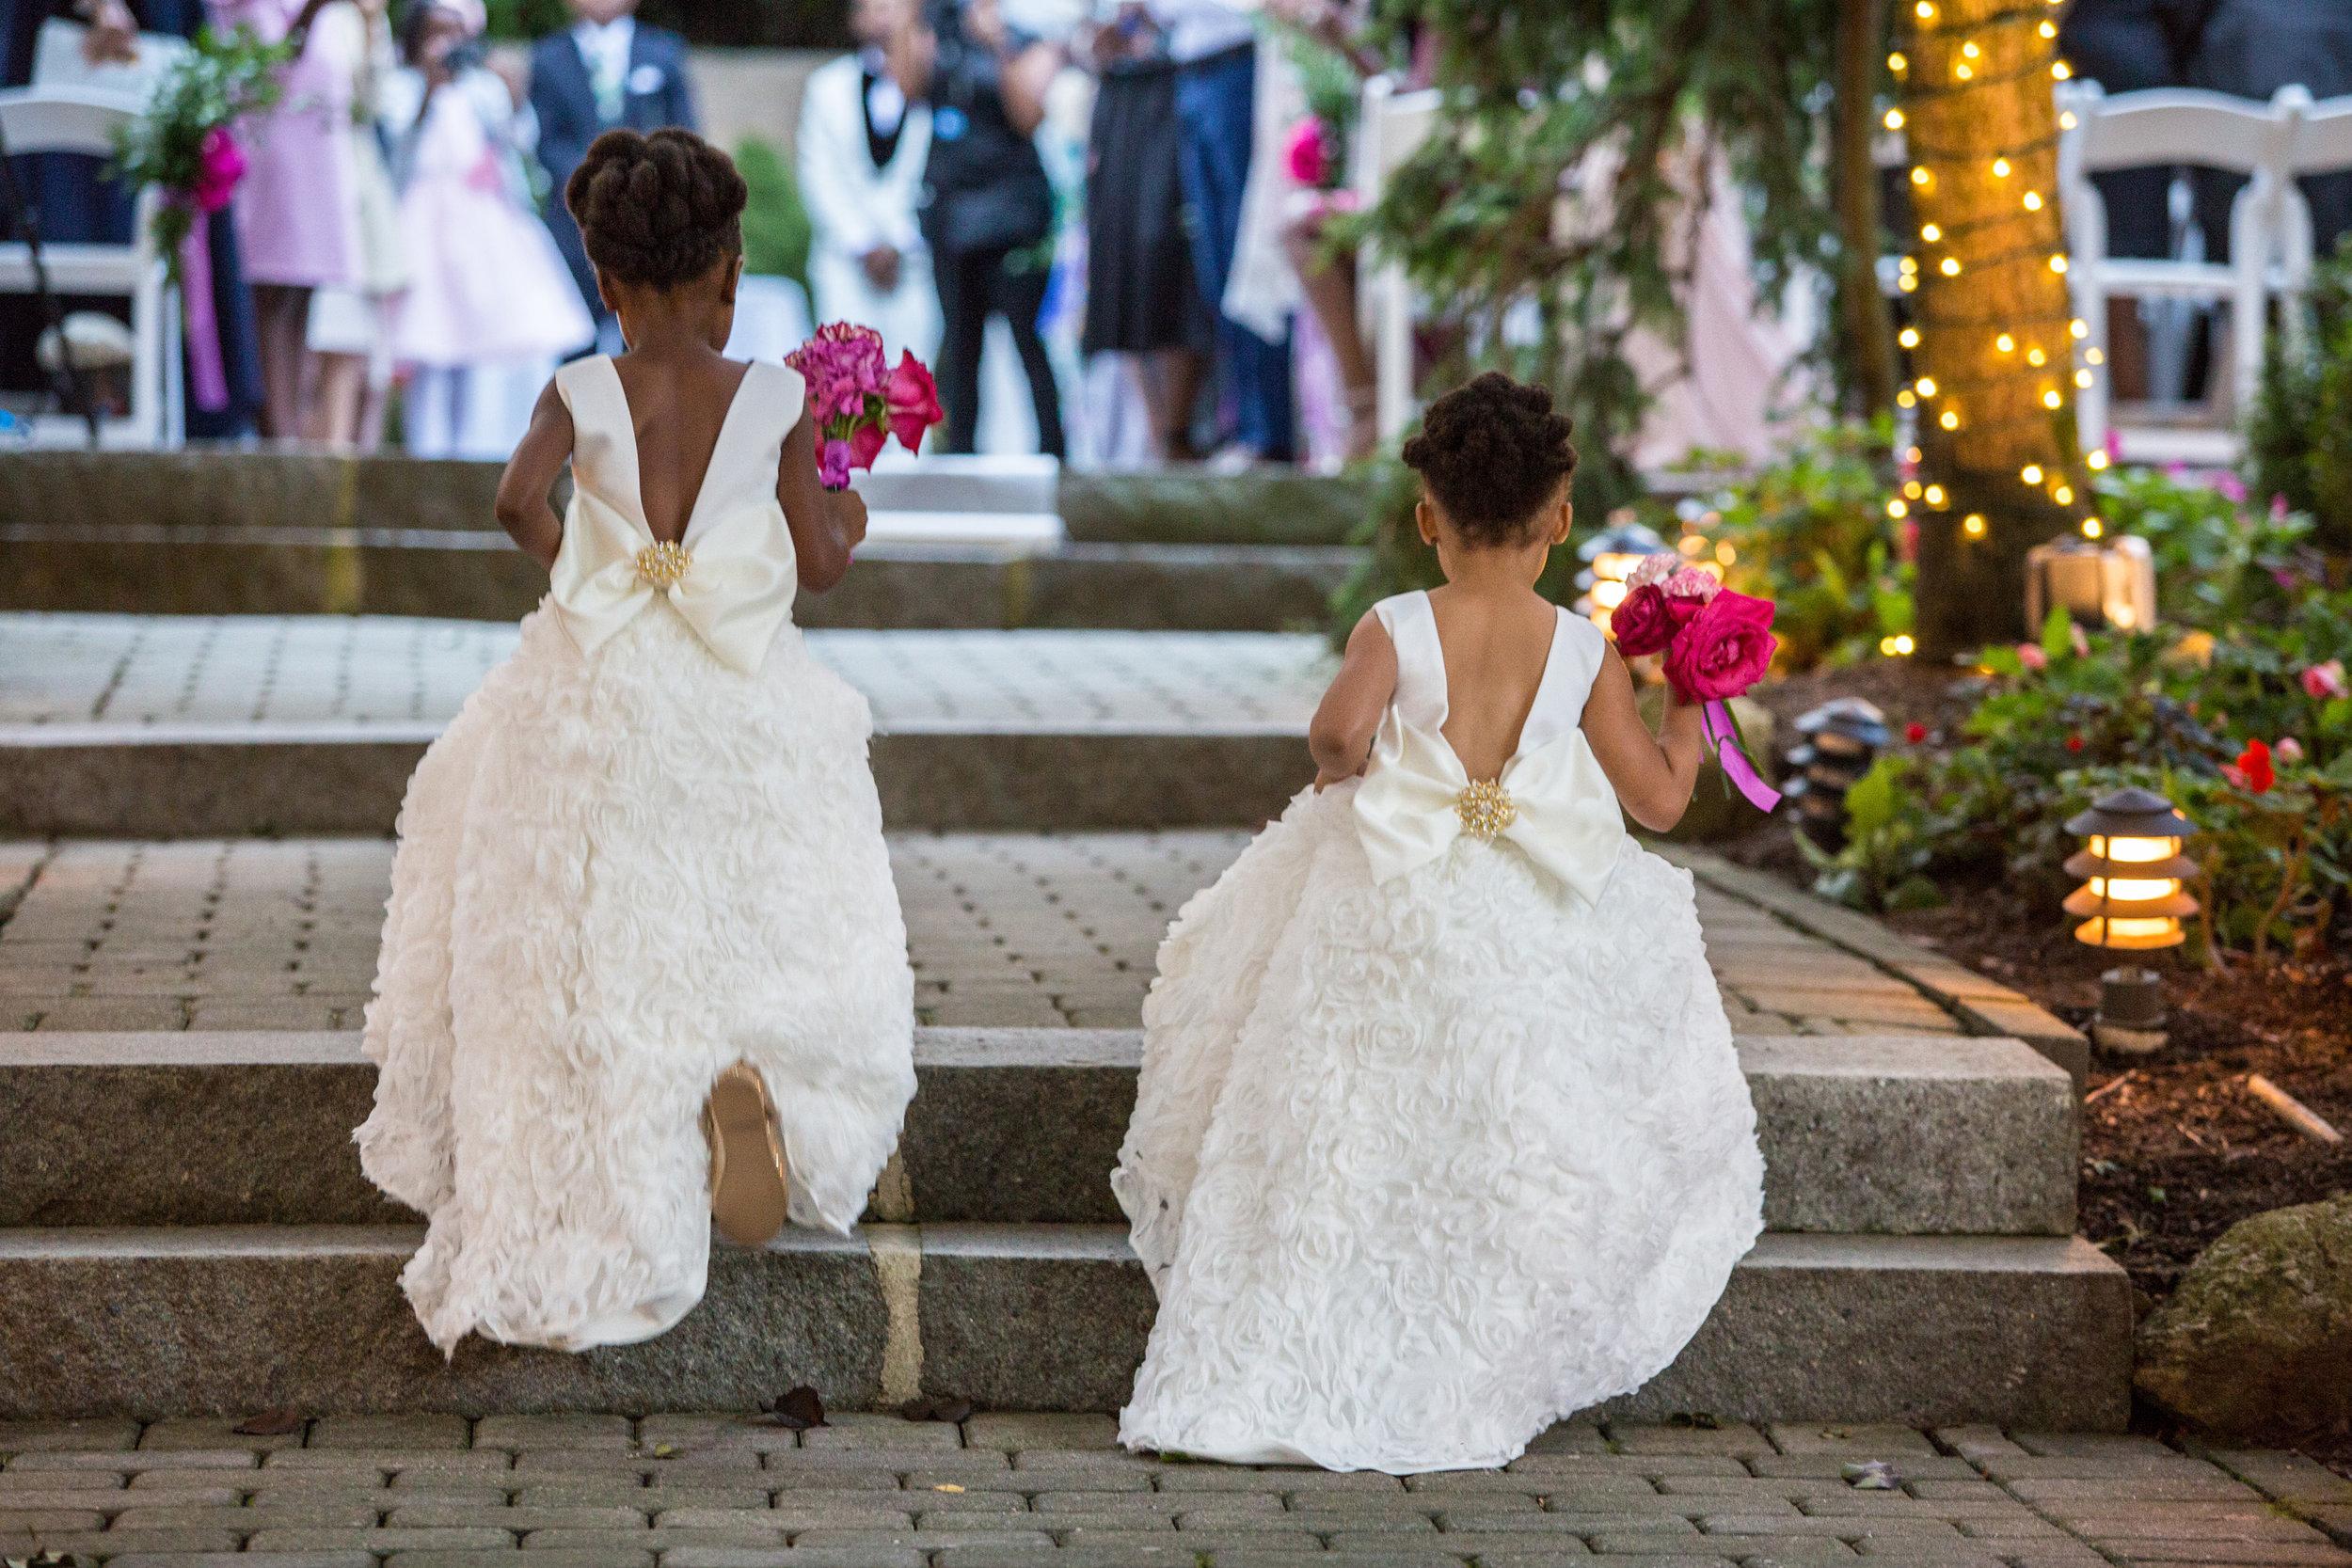 victorious-events-nyc-016-romie-kamali-tides-estate-wedding-nana-annan.jpg